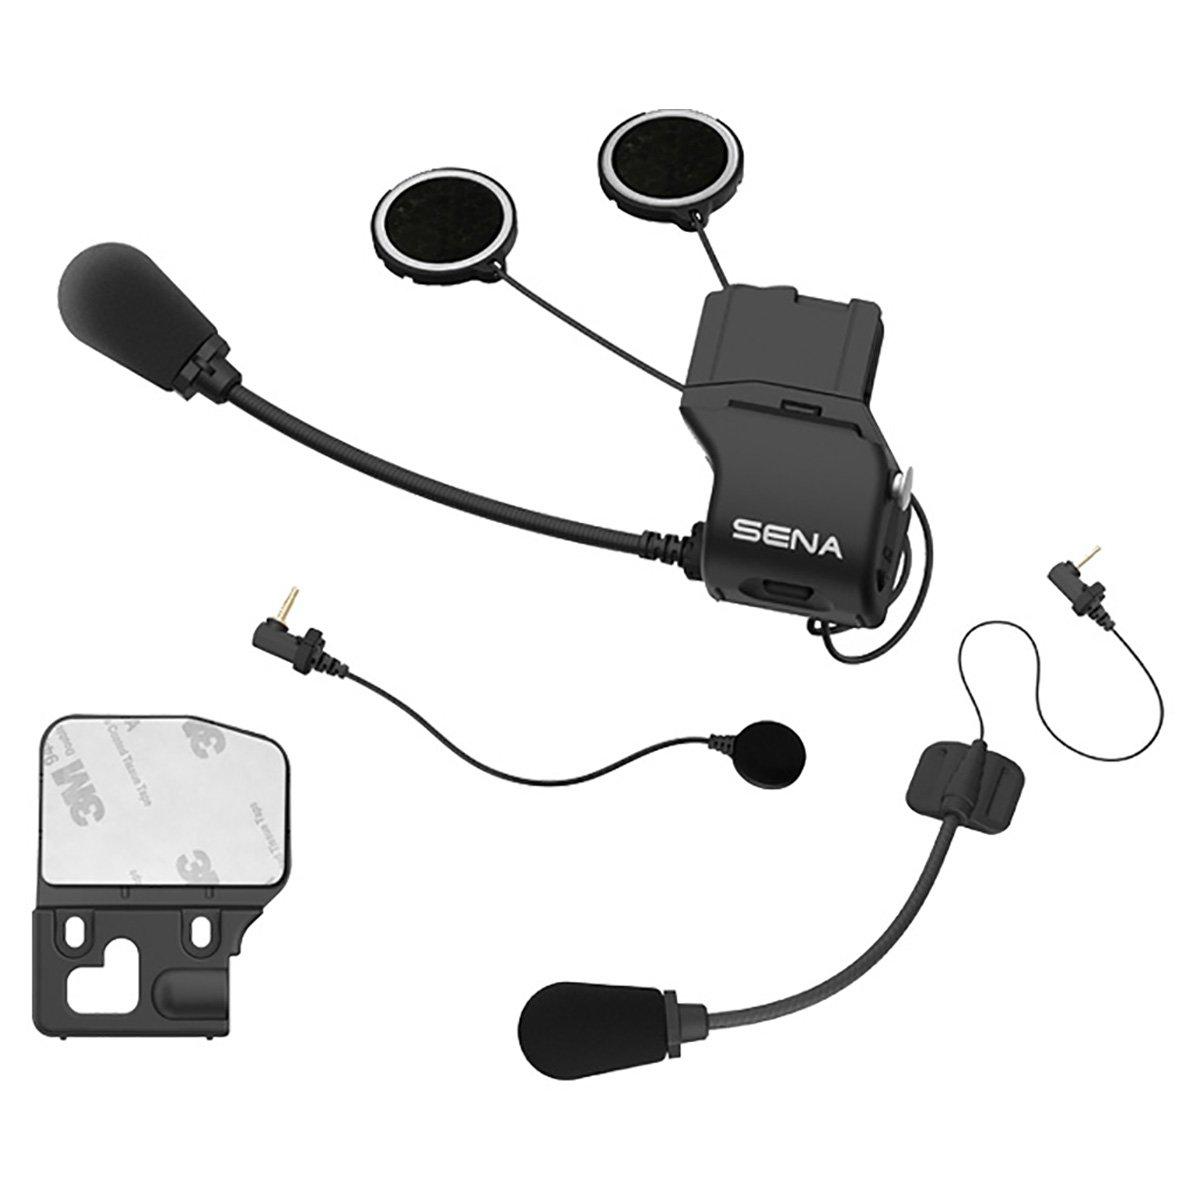 Sena 20S Universal Helmet Clamp Kit with Microphones